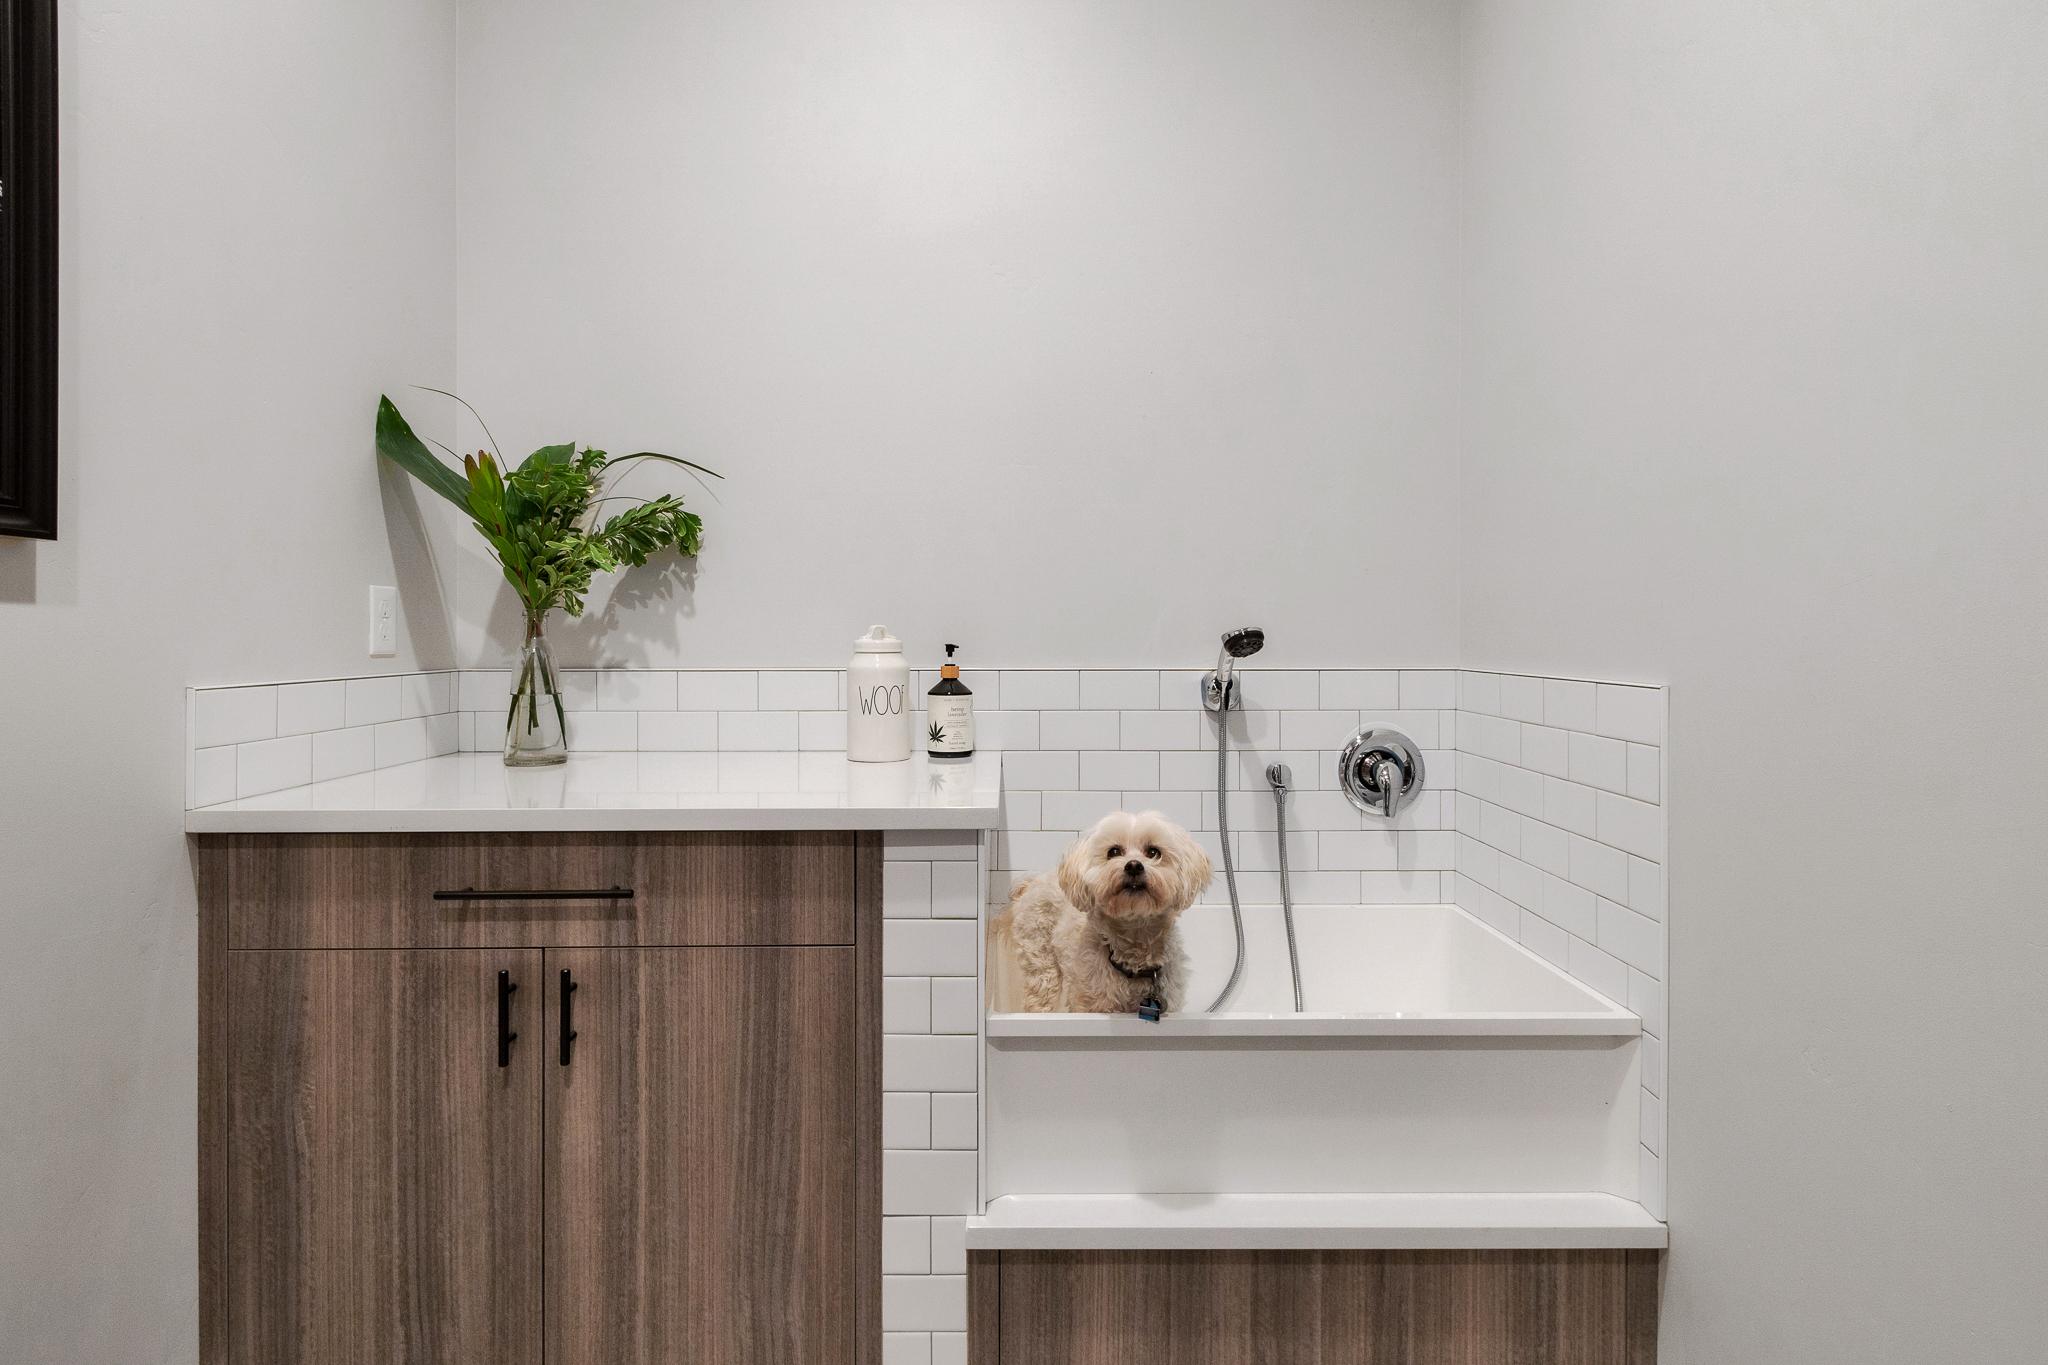 cv 9 dog shower utility room